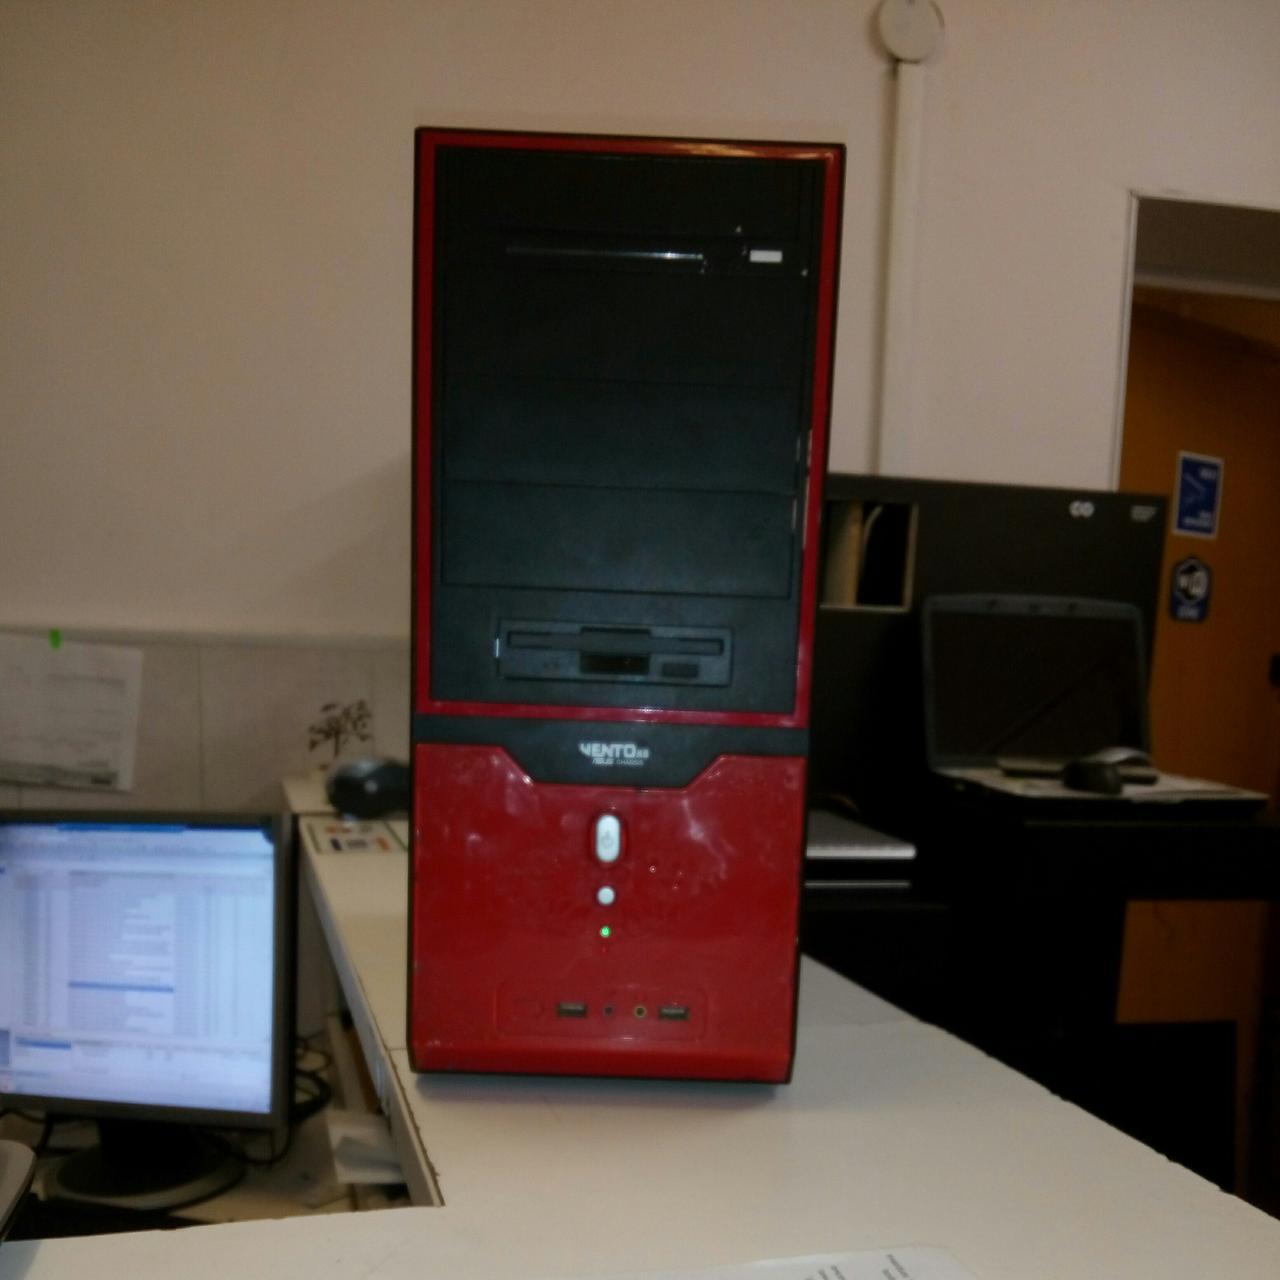 Настольный компьютер Intel 946/Intel DualCore E4300 1.8GHz/2Gb/80Gb/In